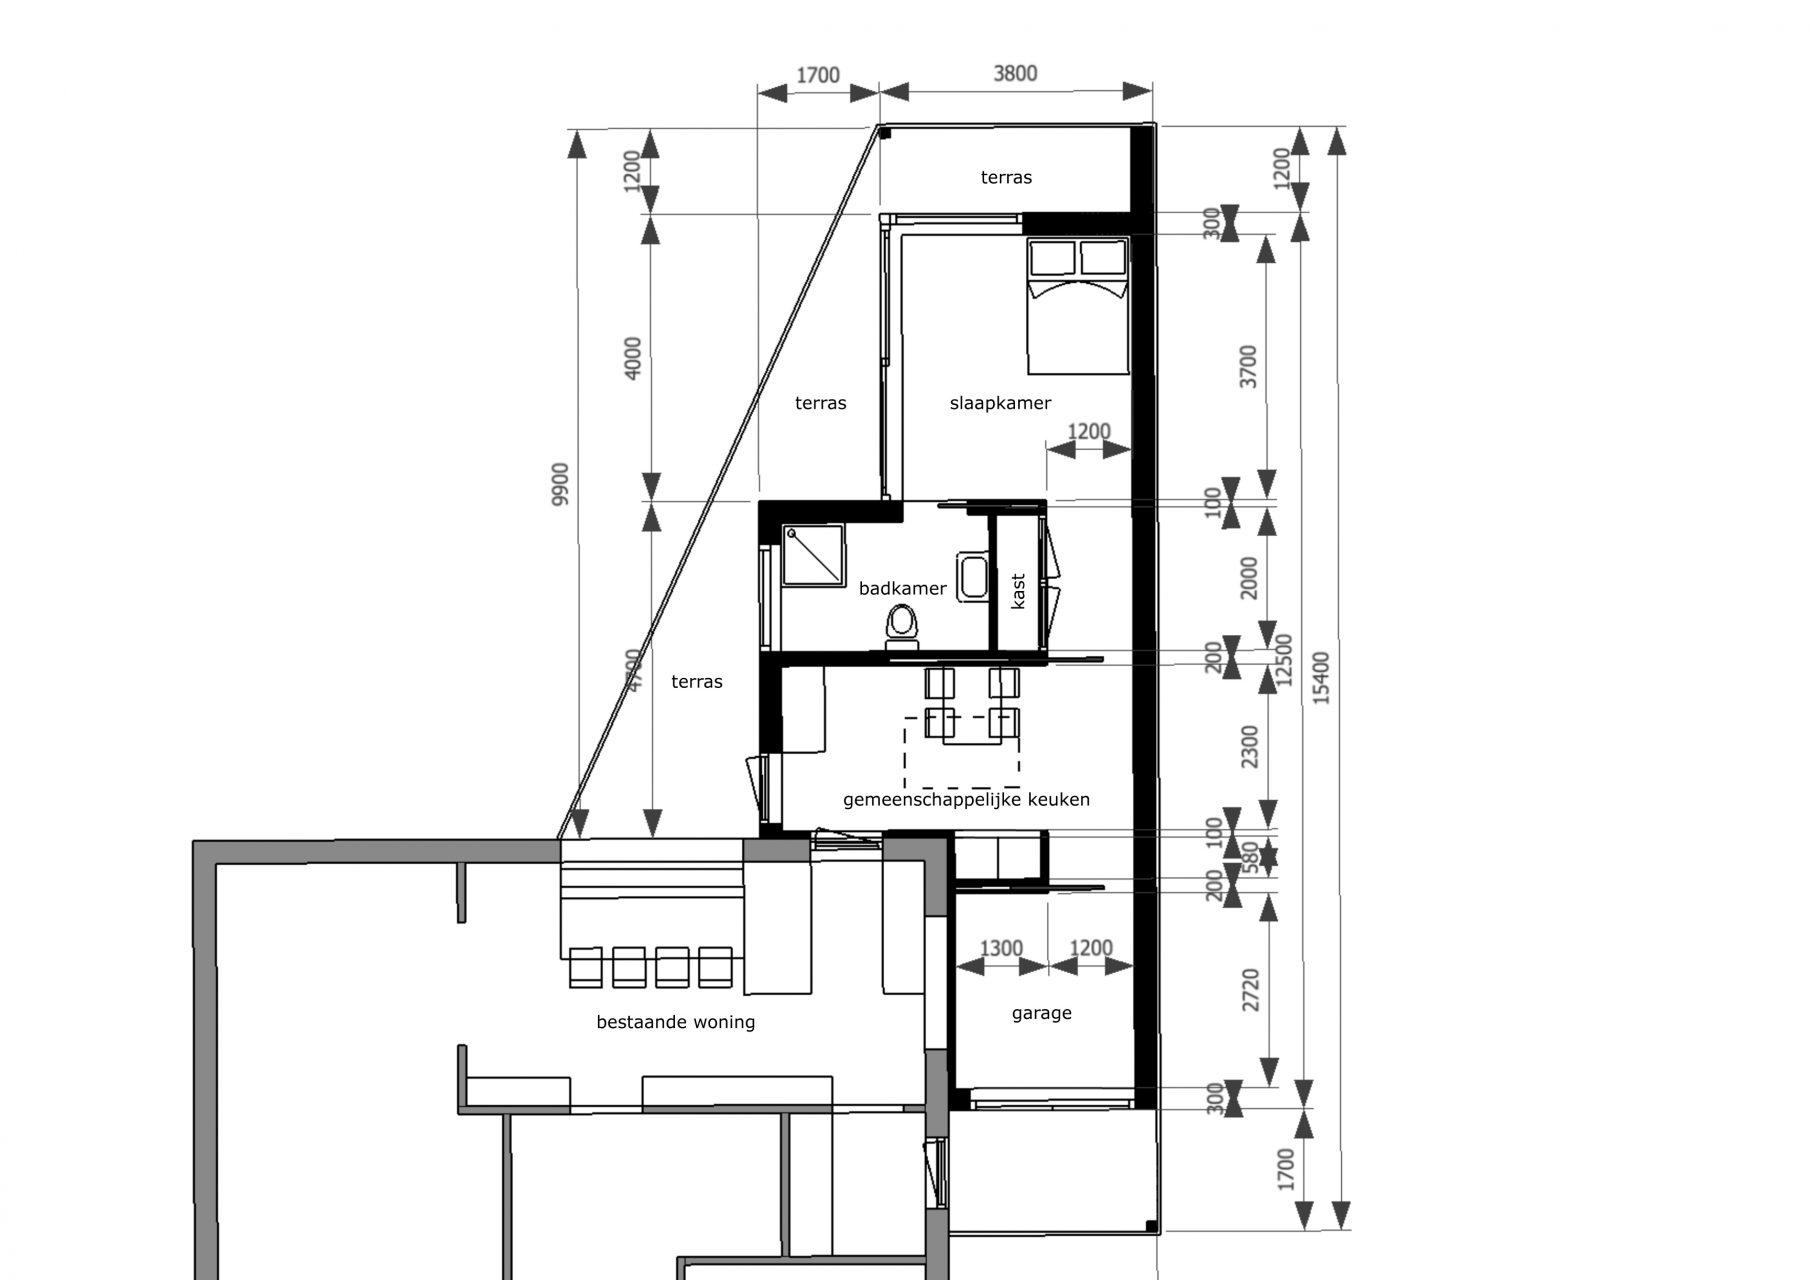 plattegronden-layout